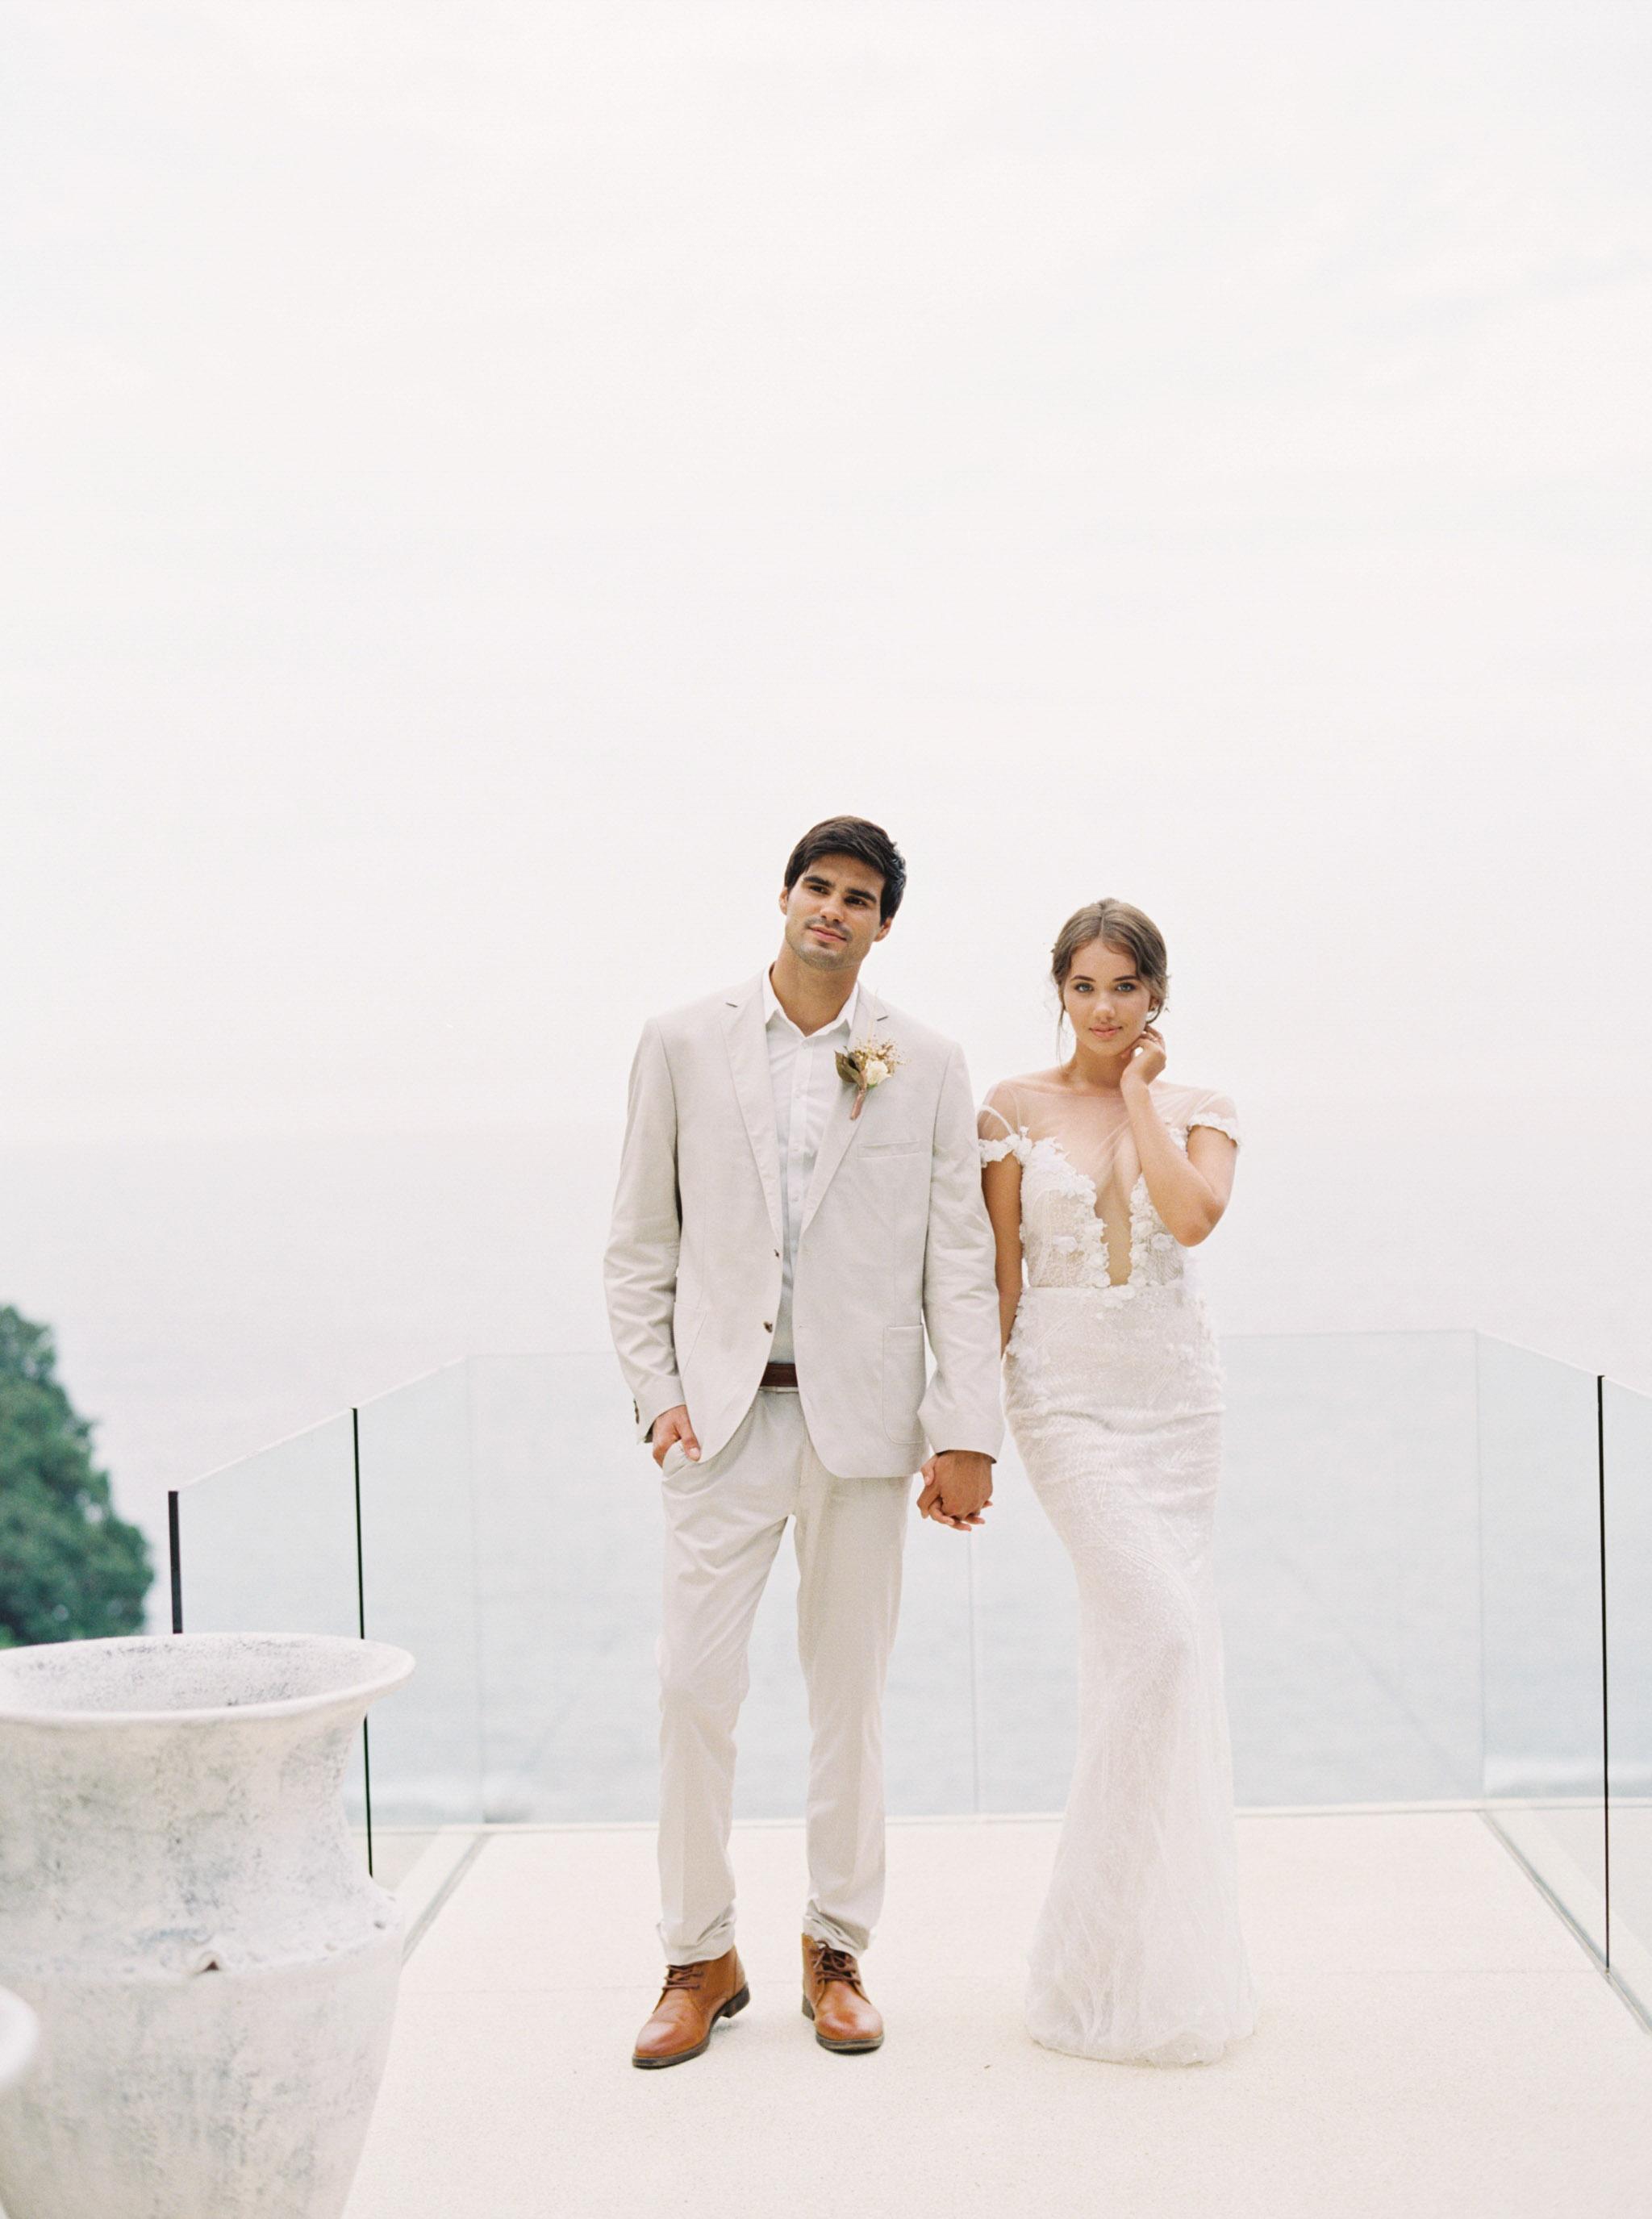 Destination Wedding Phuket Thailand Fine Art Film Photographer Sheri McMahon-00071-71.jpg